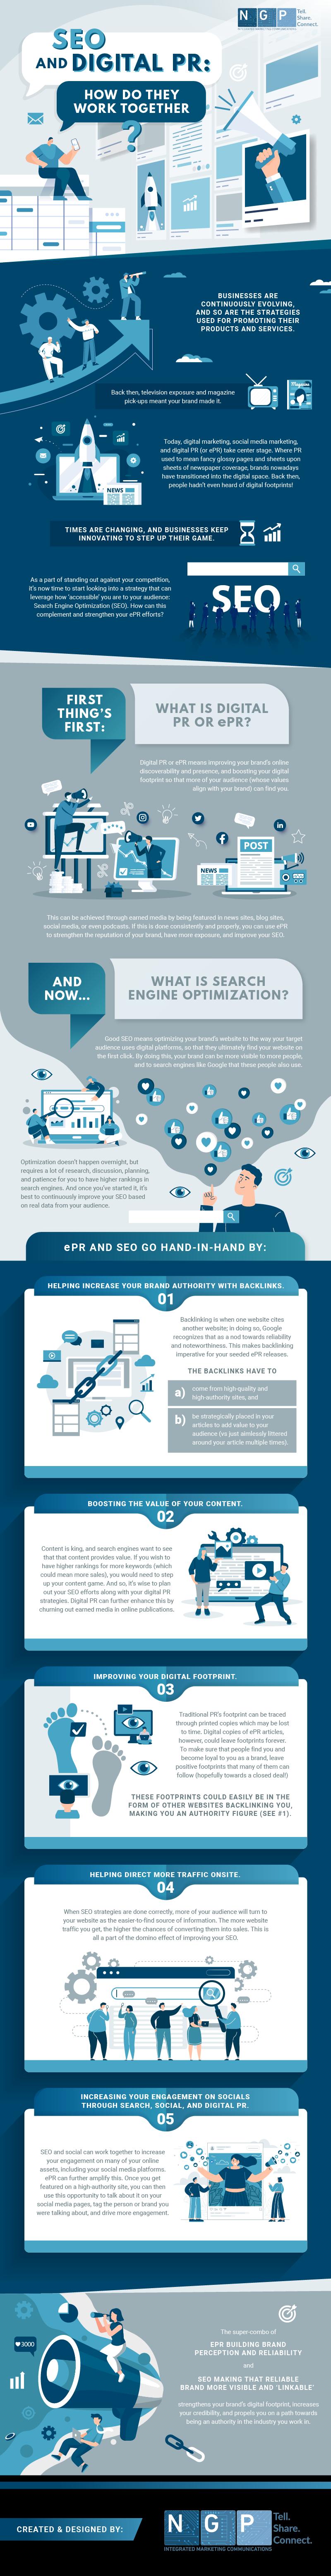 SEO and Digital PR